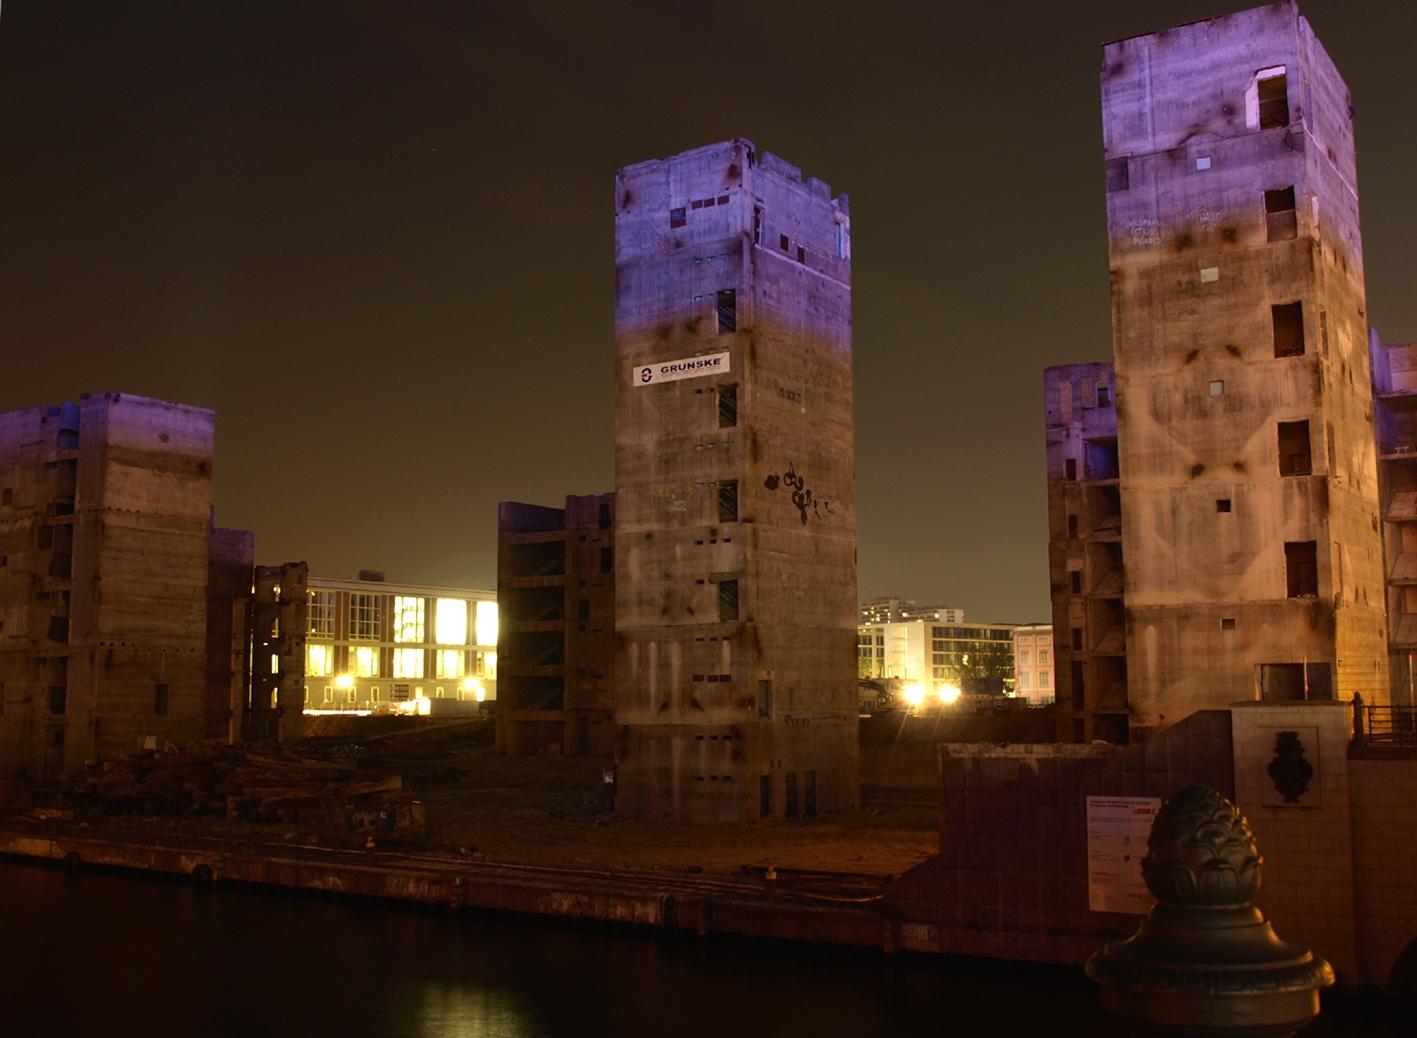 Ruine Palast der Republik, Berlin - Festival of lights